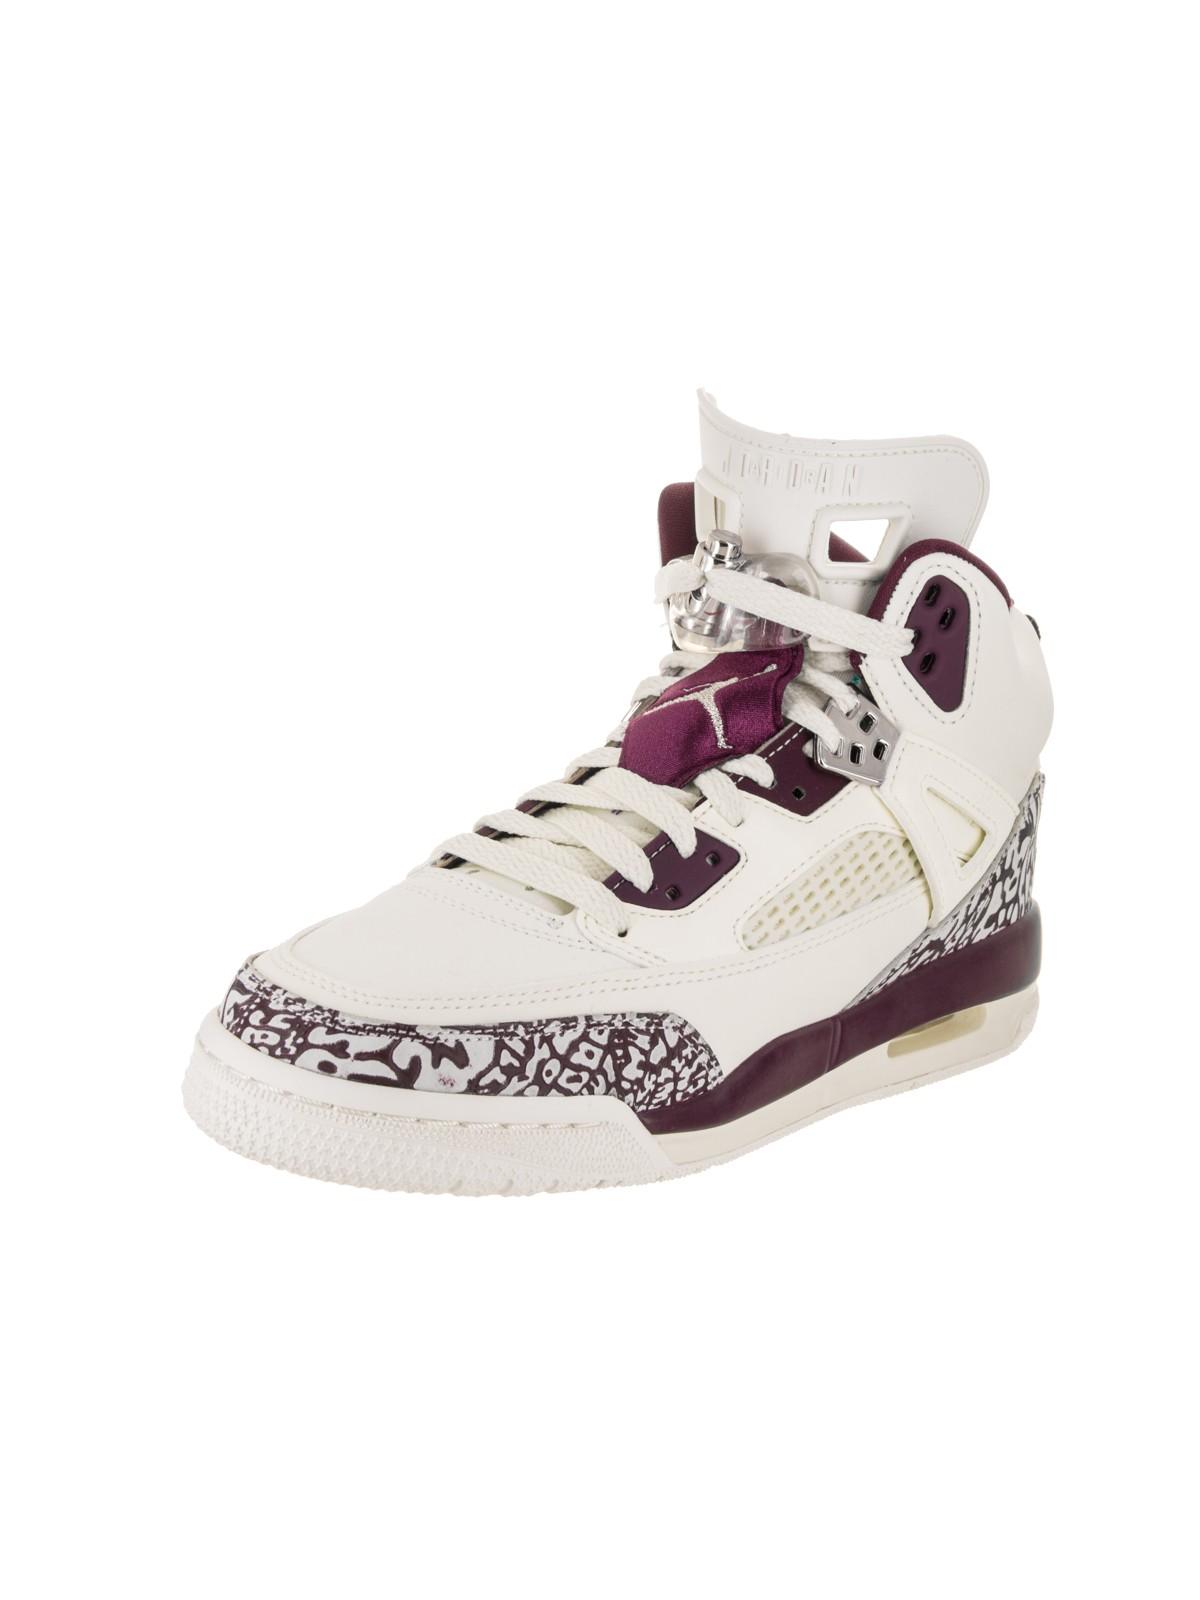 Spizike GG Big Kid's Shoes Sail/Bordeaux/Metallic Red Bronze 535712-132